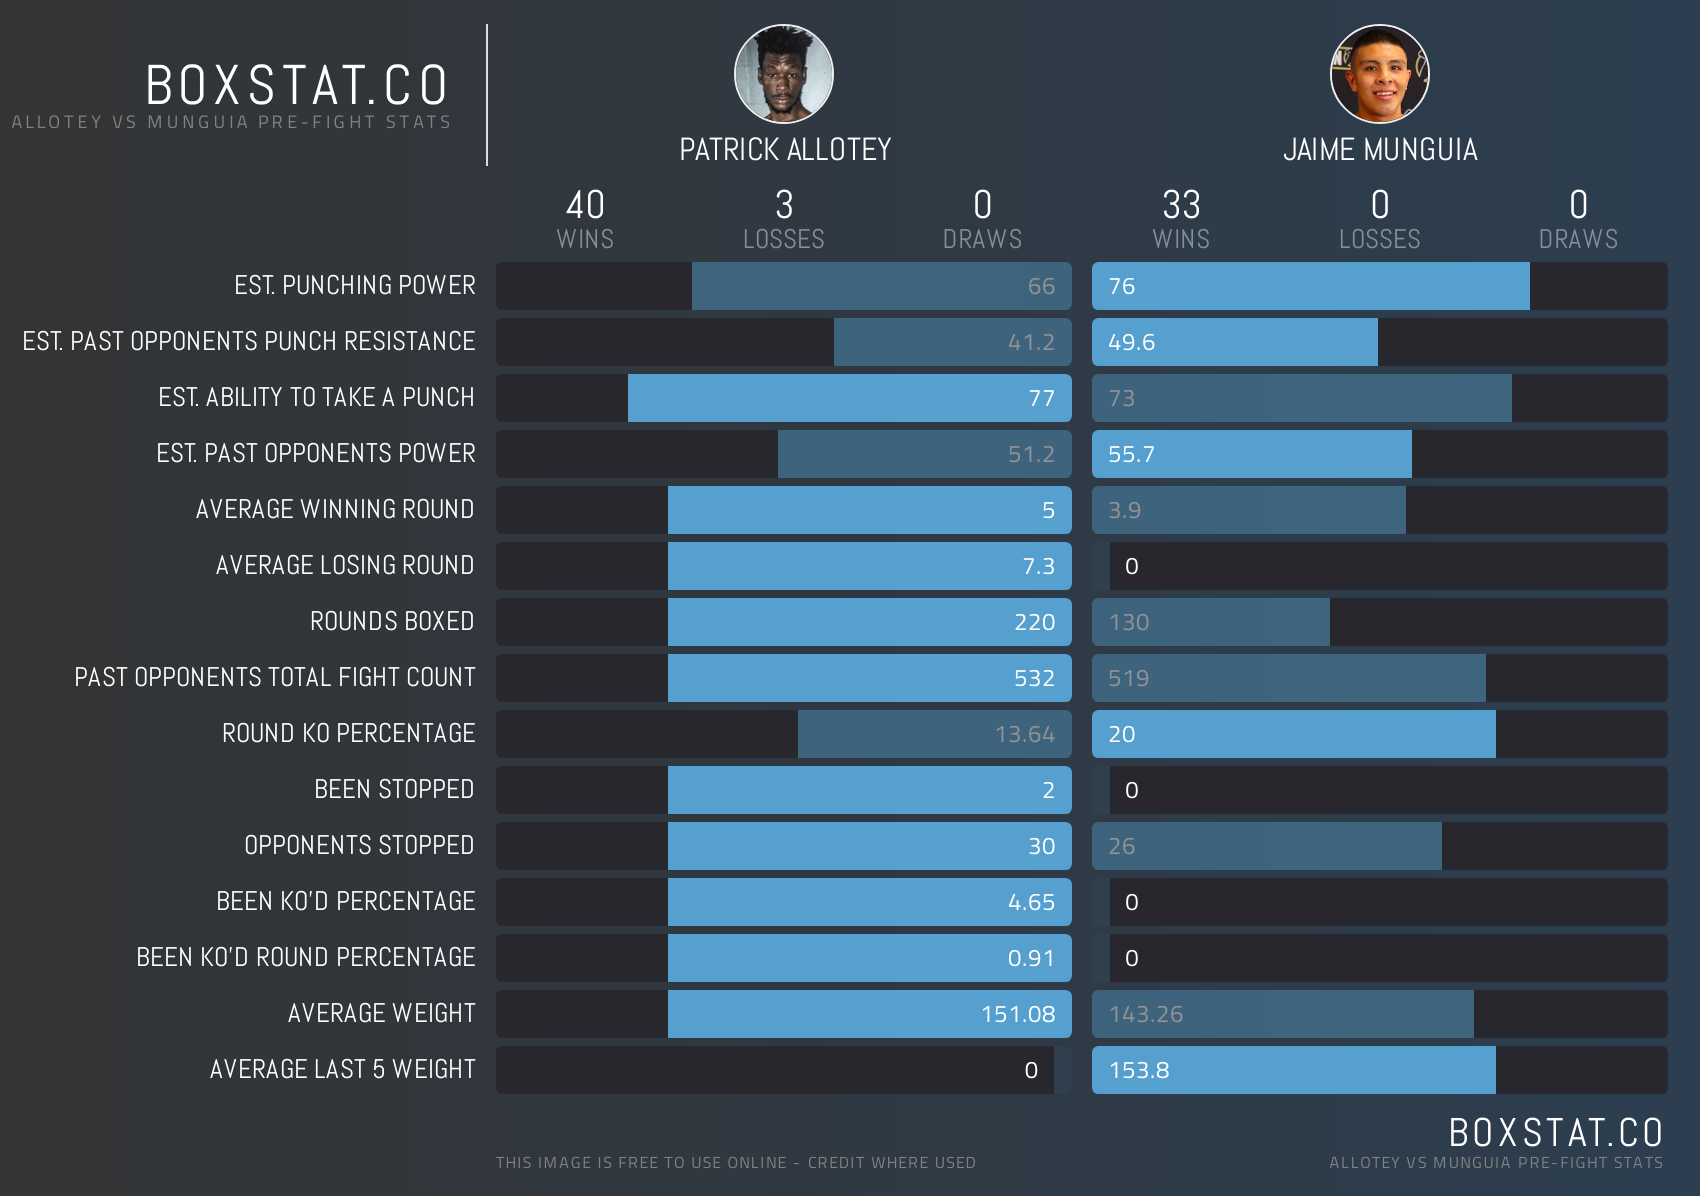 Patrick Allotey (40-3, 30 KOs) vs Jaime Munguia (33-0, 26 KOs) - Head to Head Stats. Stats Credit: BoxStat.co